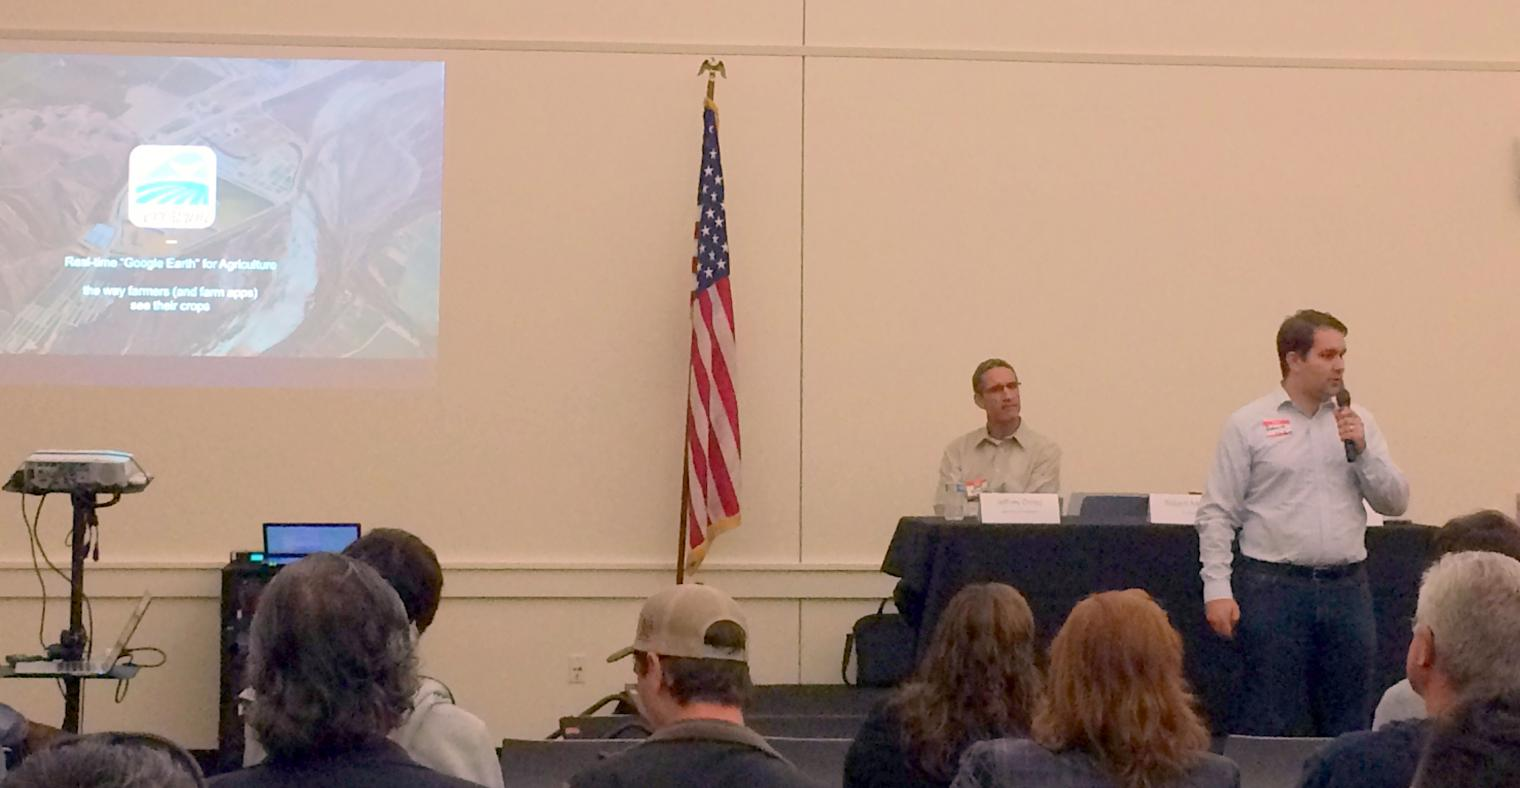 Robert Morris from TerrAvion speaking, Jeffrey Orrey from GeoVisual Analytics on panel